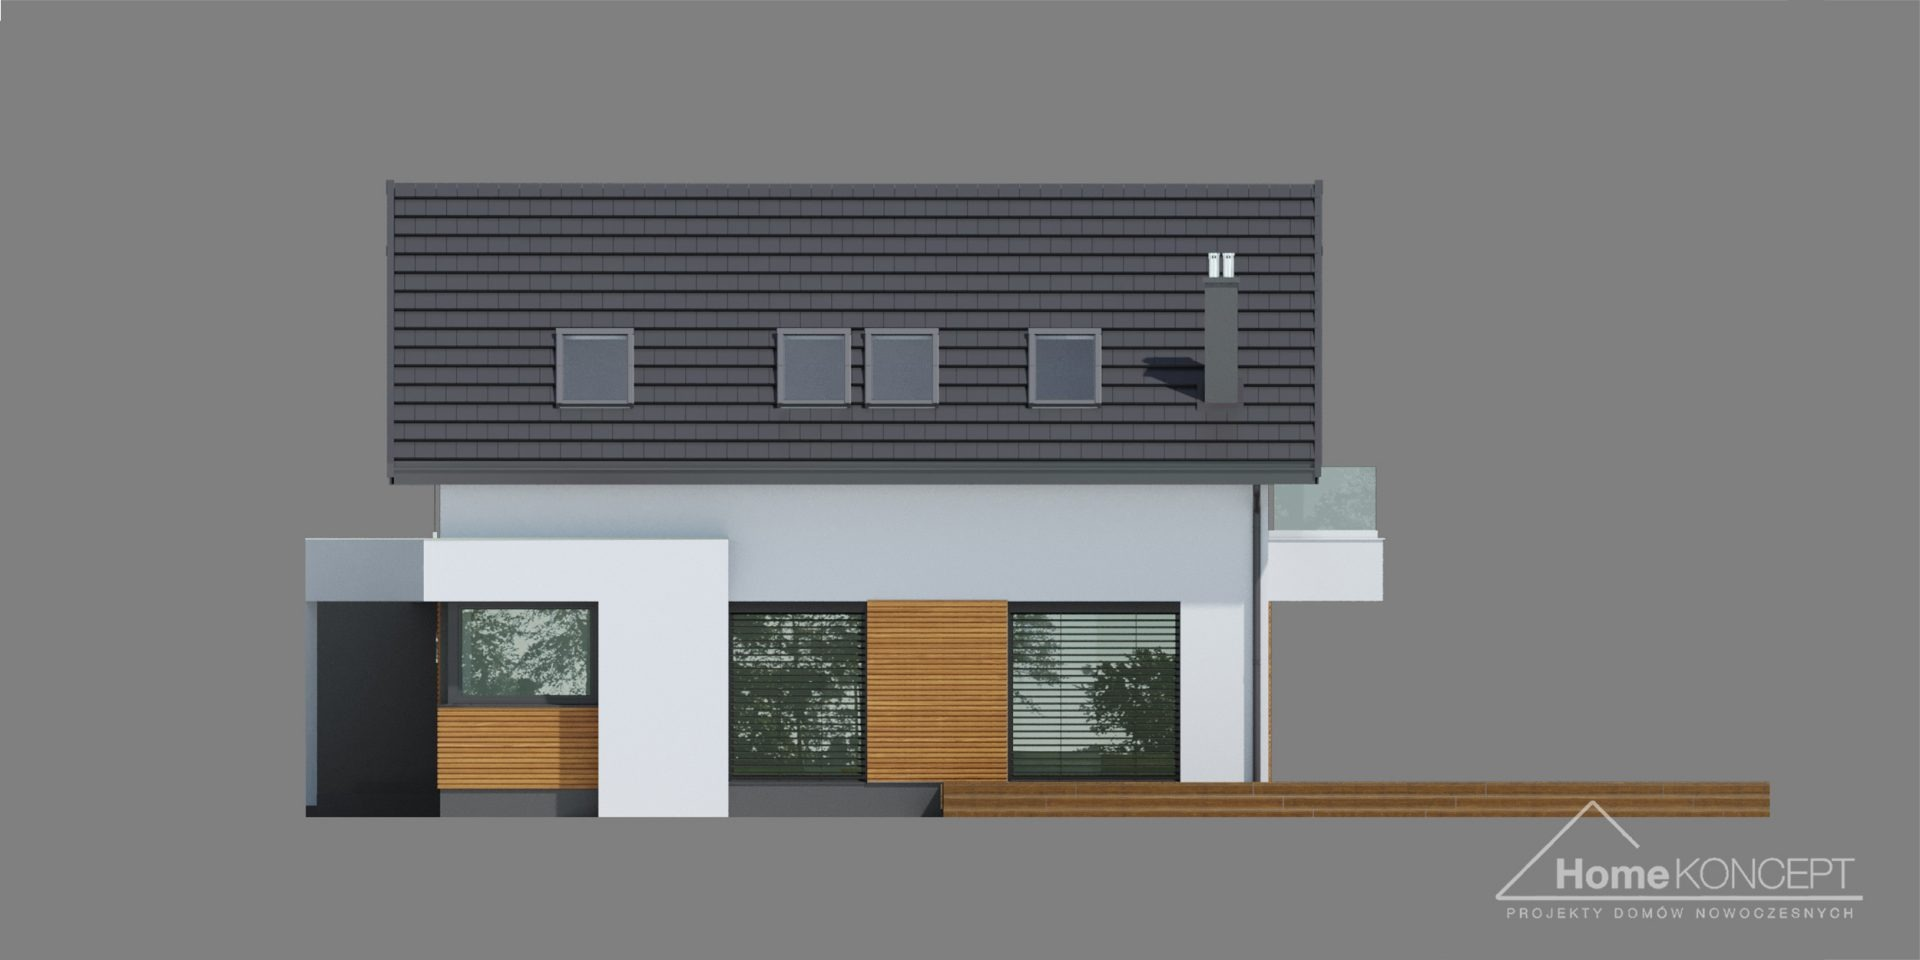 HomeKONCEPT 72 projekt domu nowoczesnego